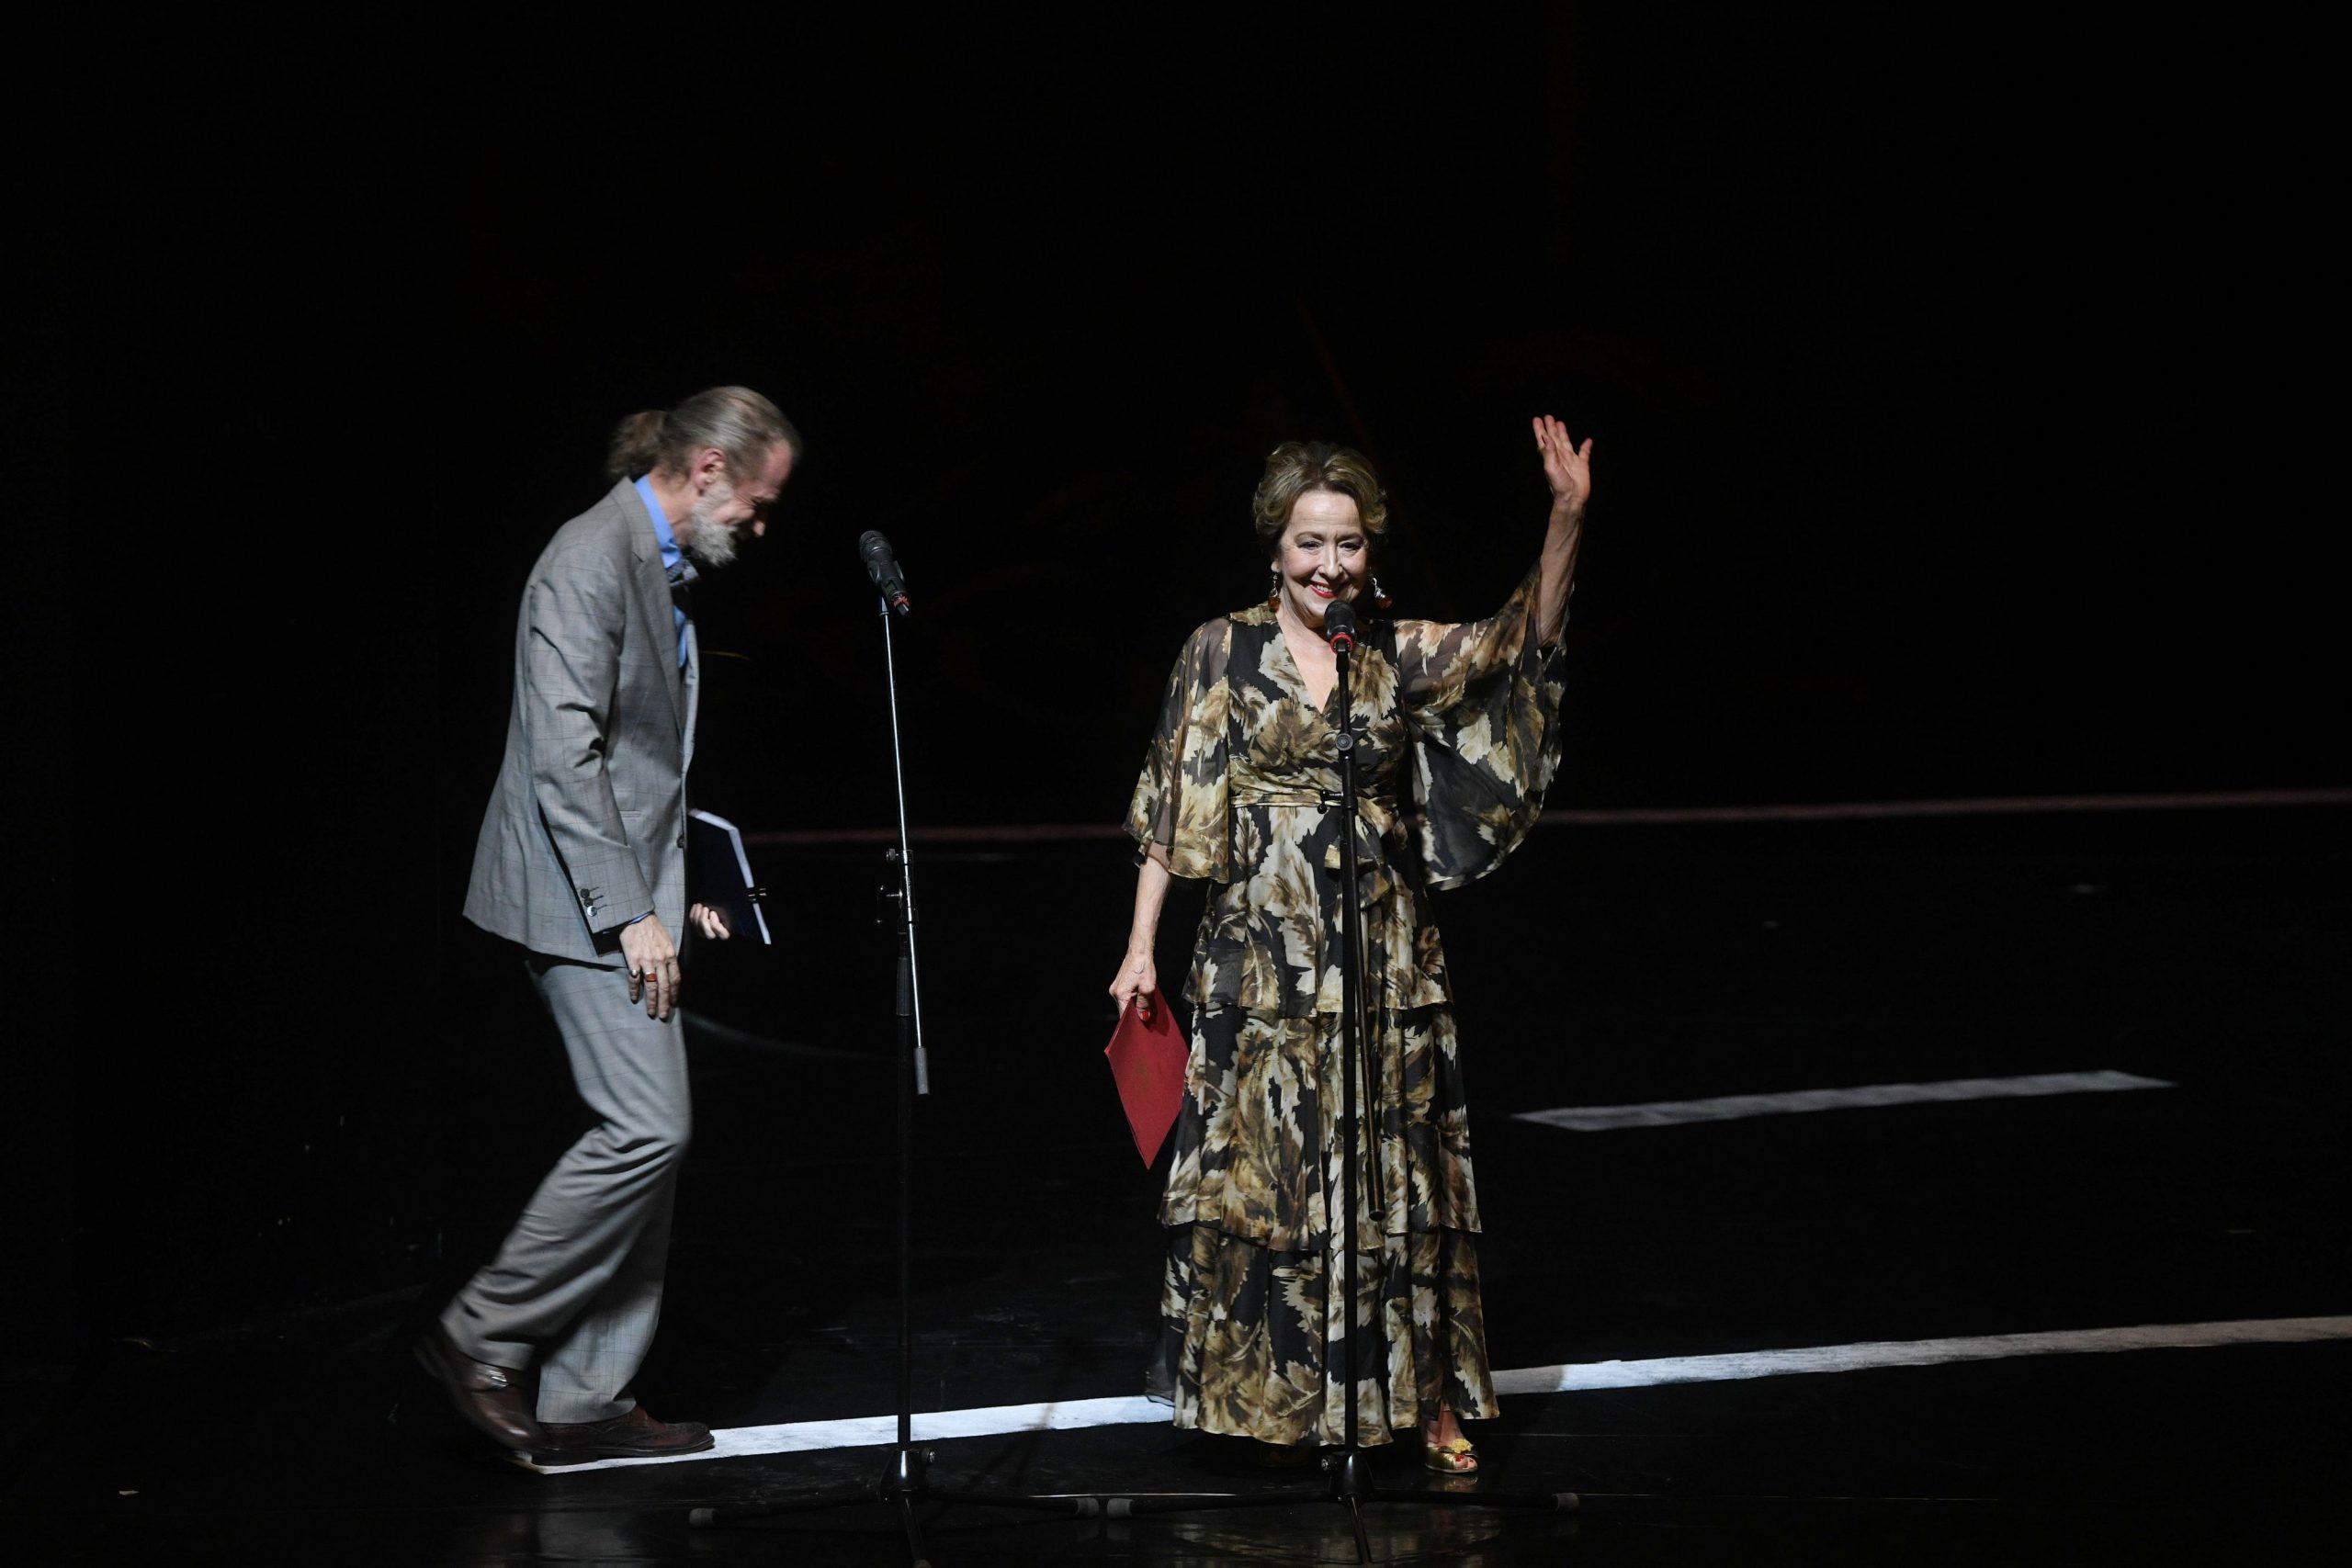 Svetlana Ceca Bojković Otvaranje Bitefa u Jugoslovenskom dramskom pozorištu, JDP, Jugoslovensko dramsko pozorište